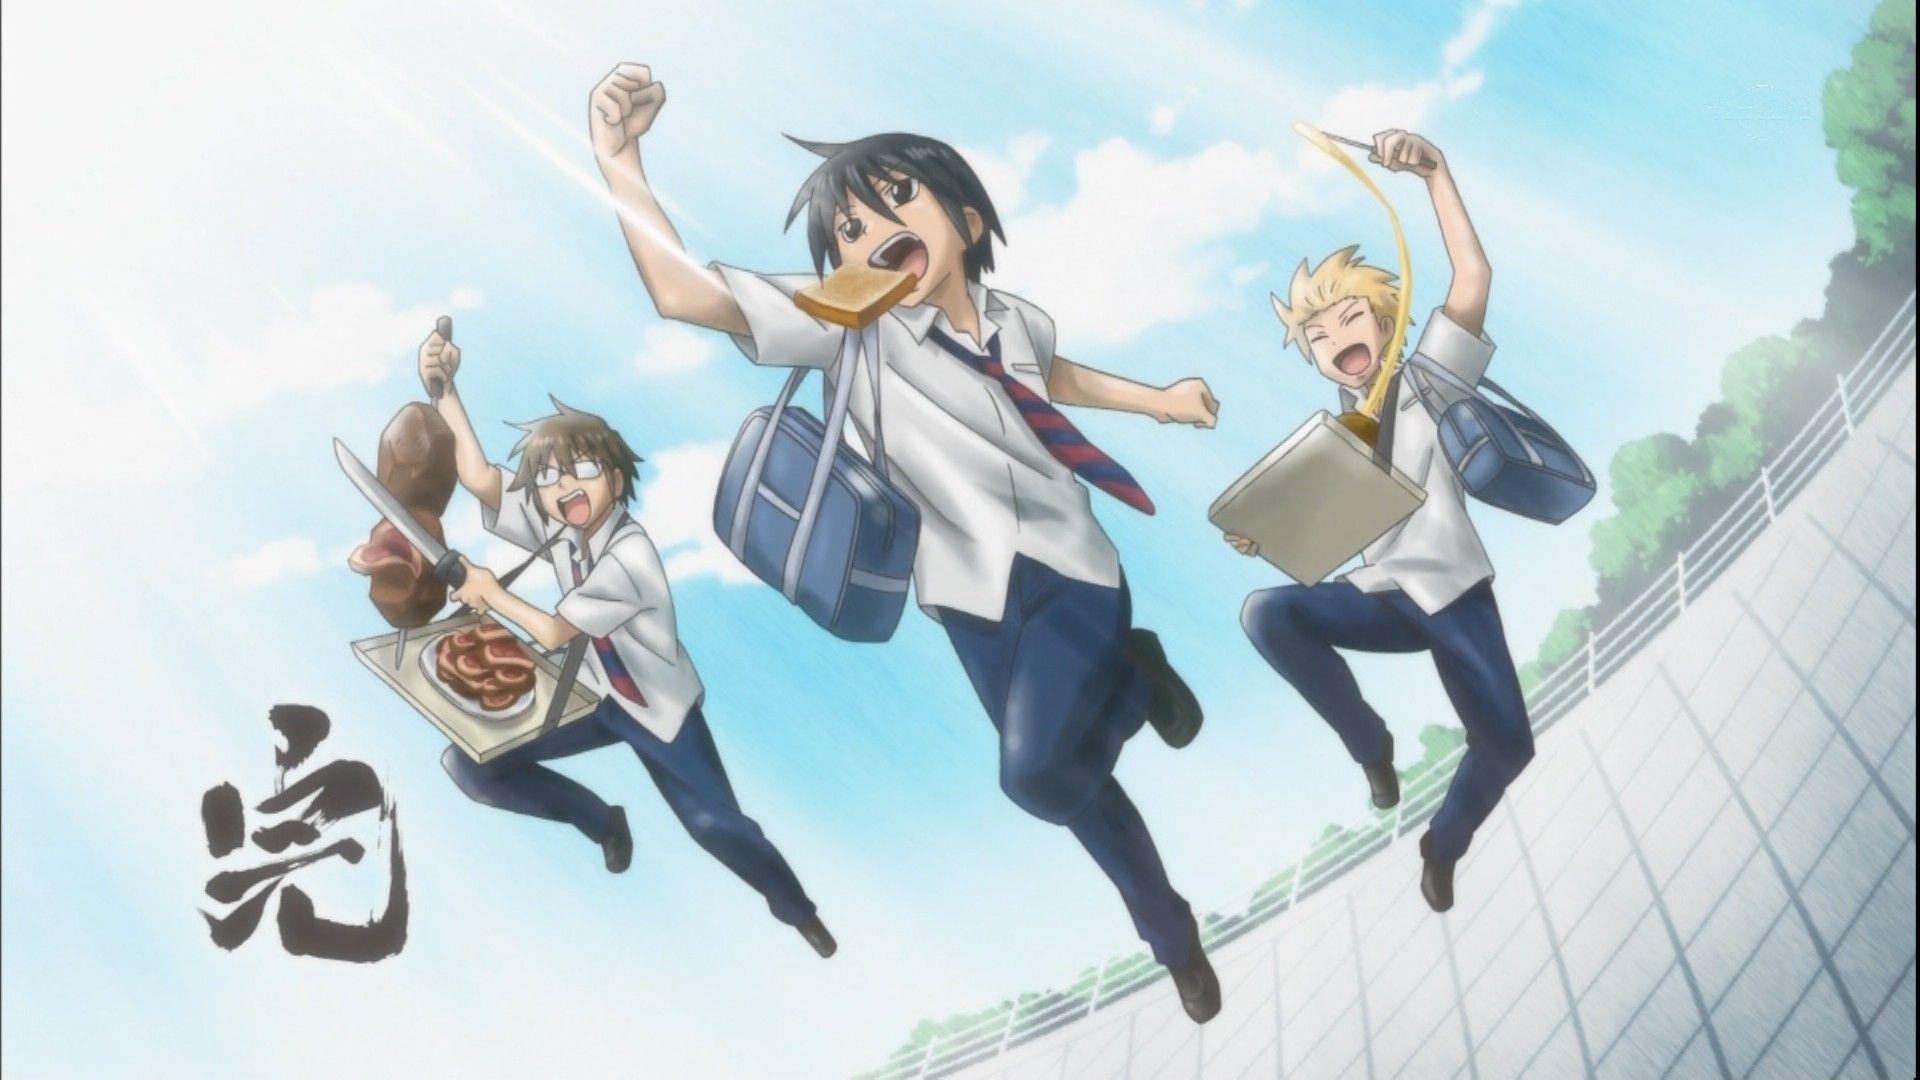 Pin Oleh Ardi Iscahyono Di Anime Dp Seni